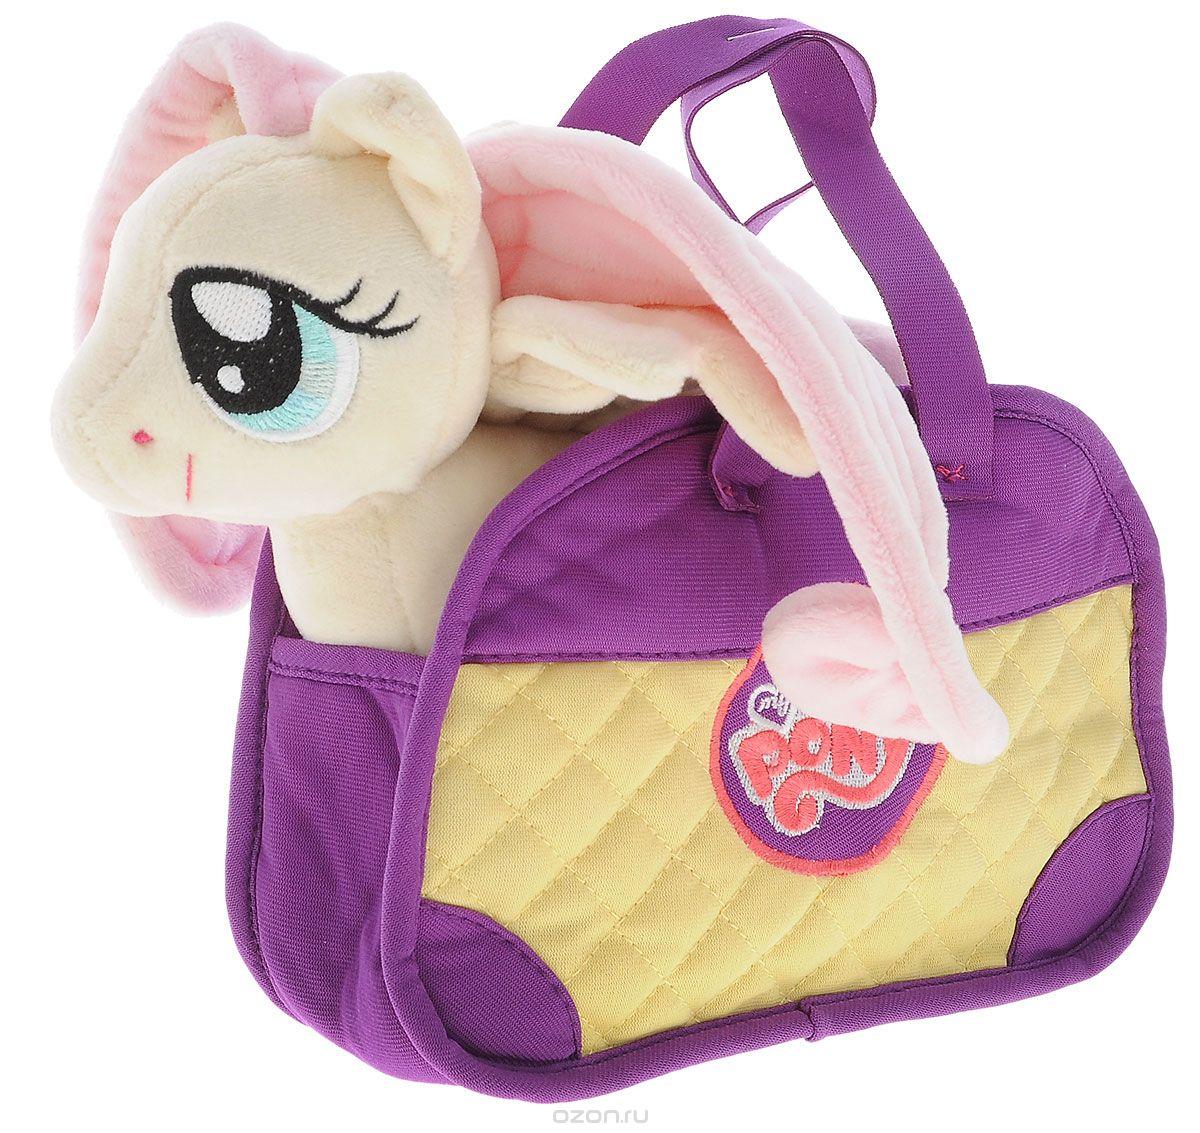 My Little Pony Мягкая игрушка Пони Флаттершай цвет сумки сиреневый желтый 20 см playskool мягкая озвученная игрушка my little pony пони рейнбоу дэш 25 см